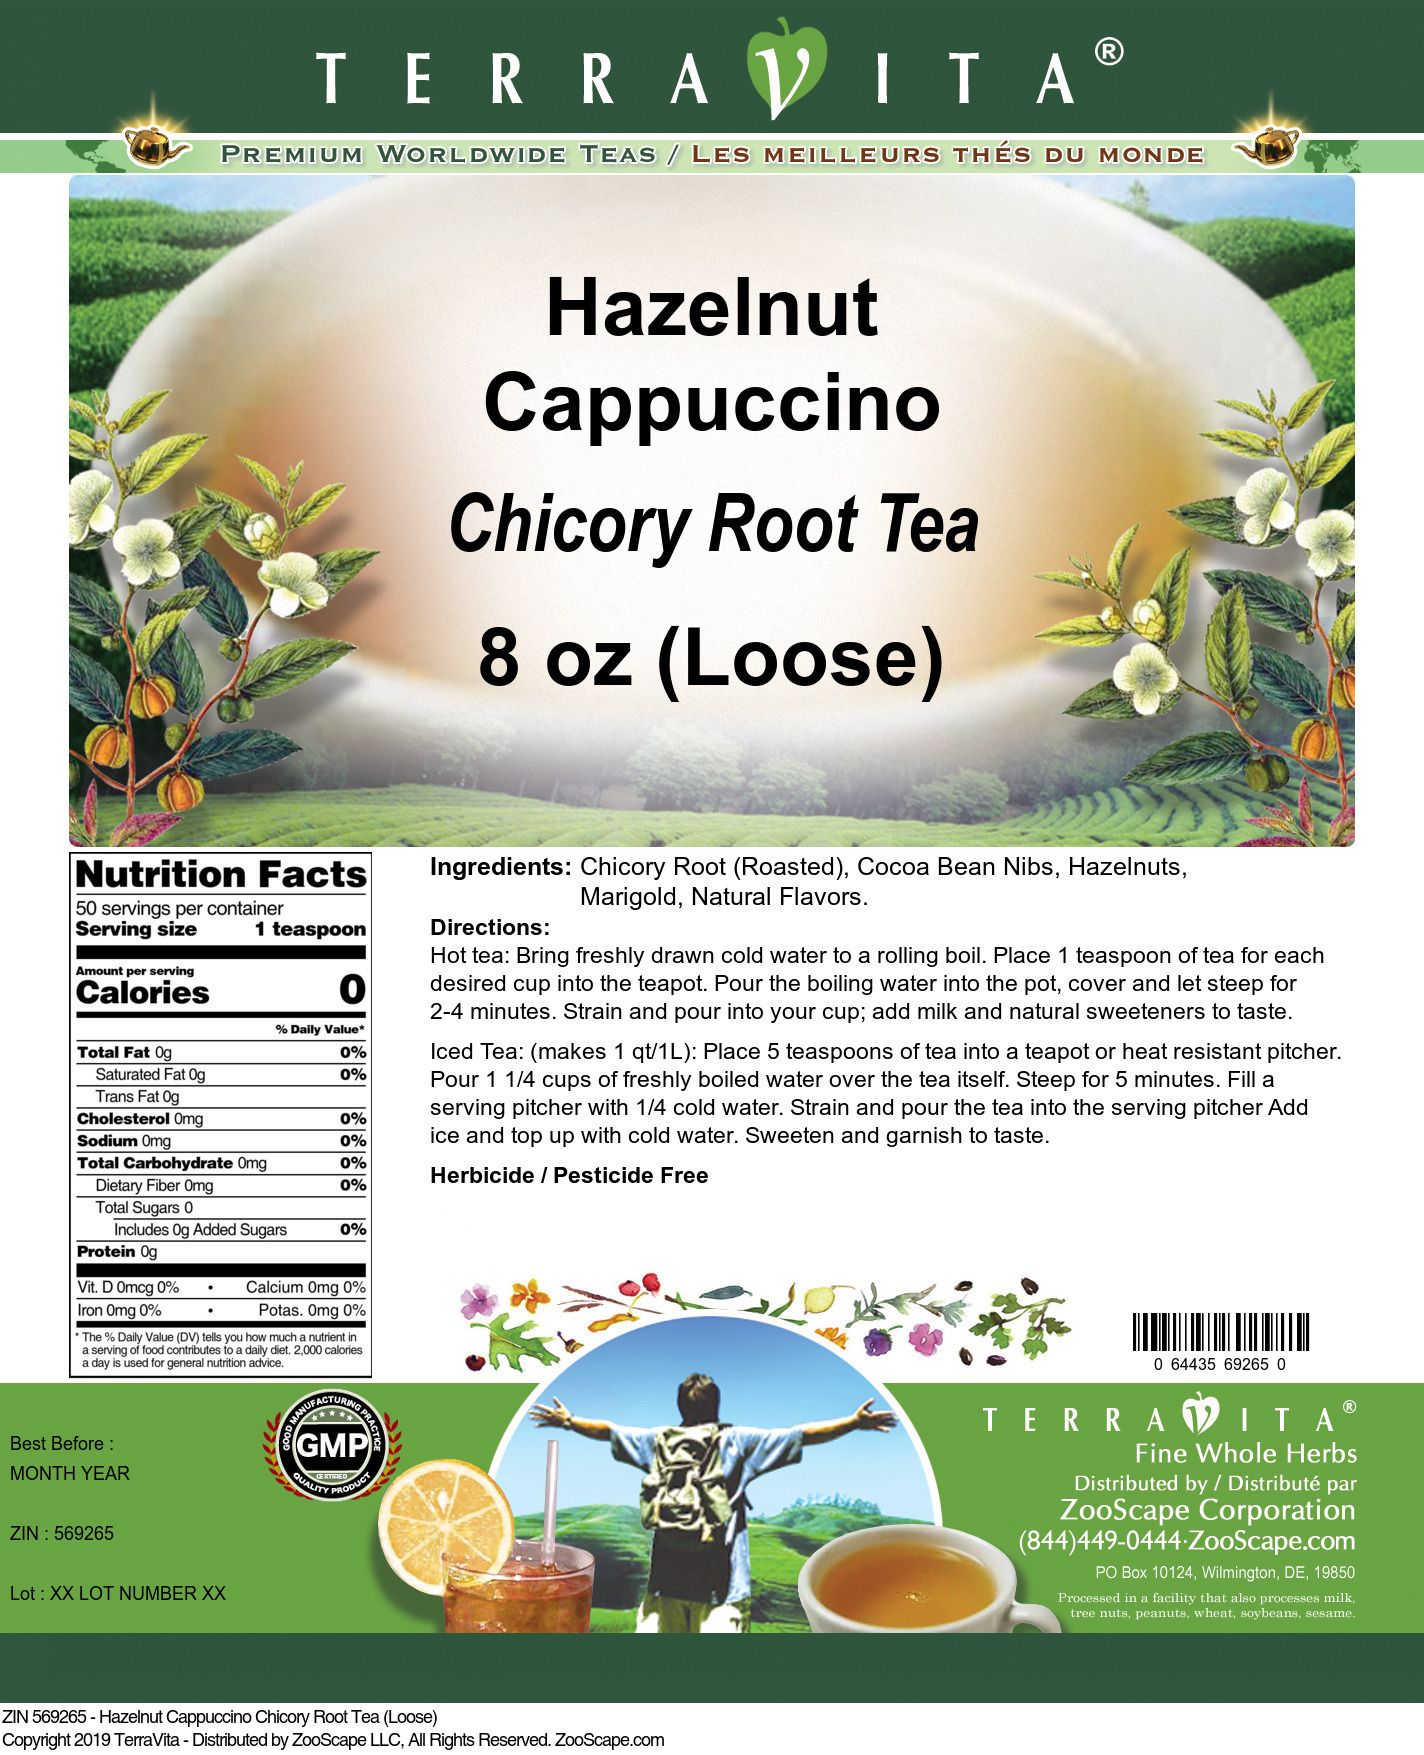 Hazelnut Cappuccino Chicory Root Tea (Loose)